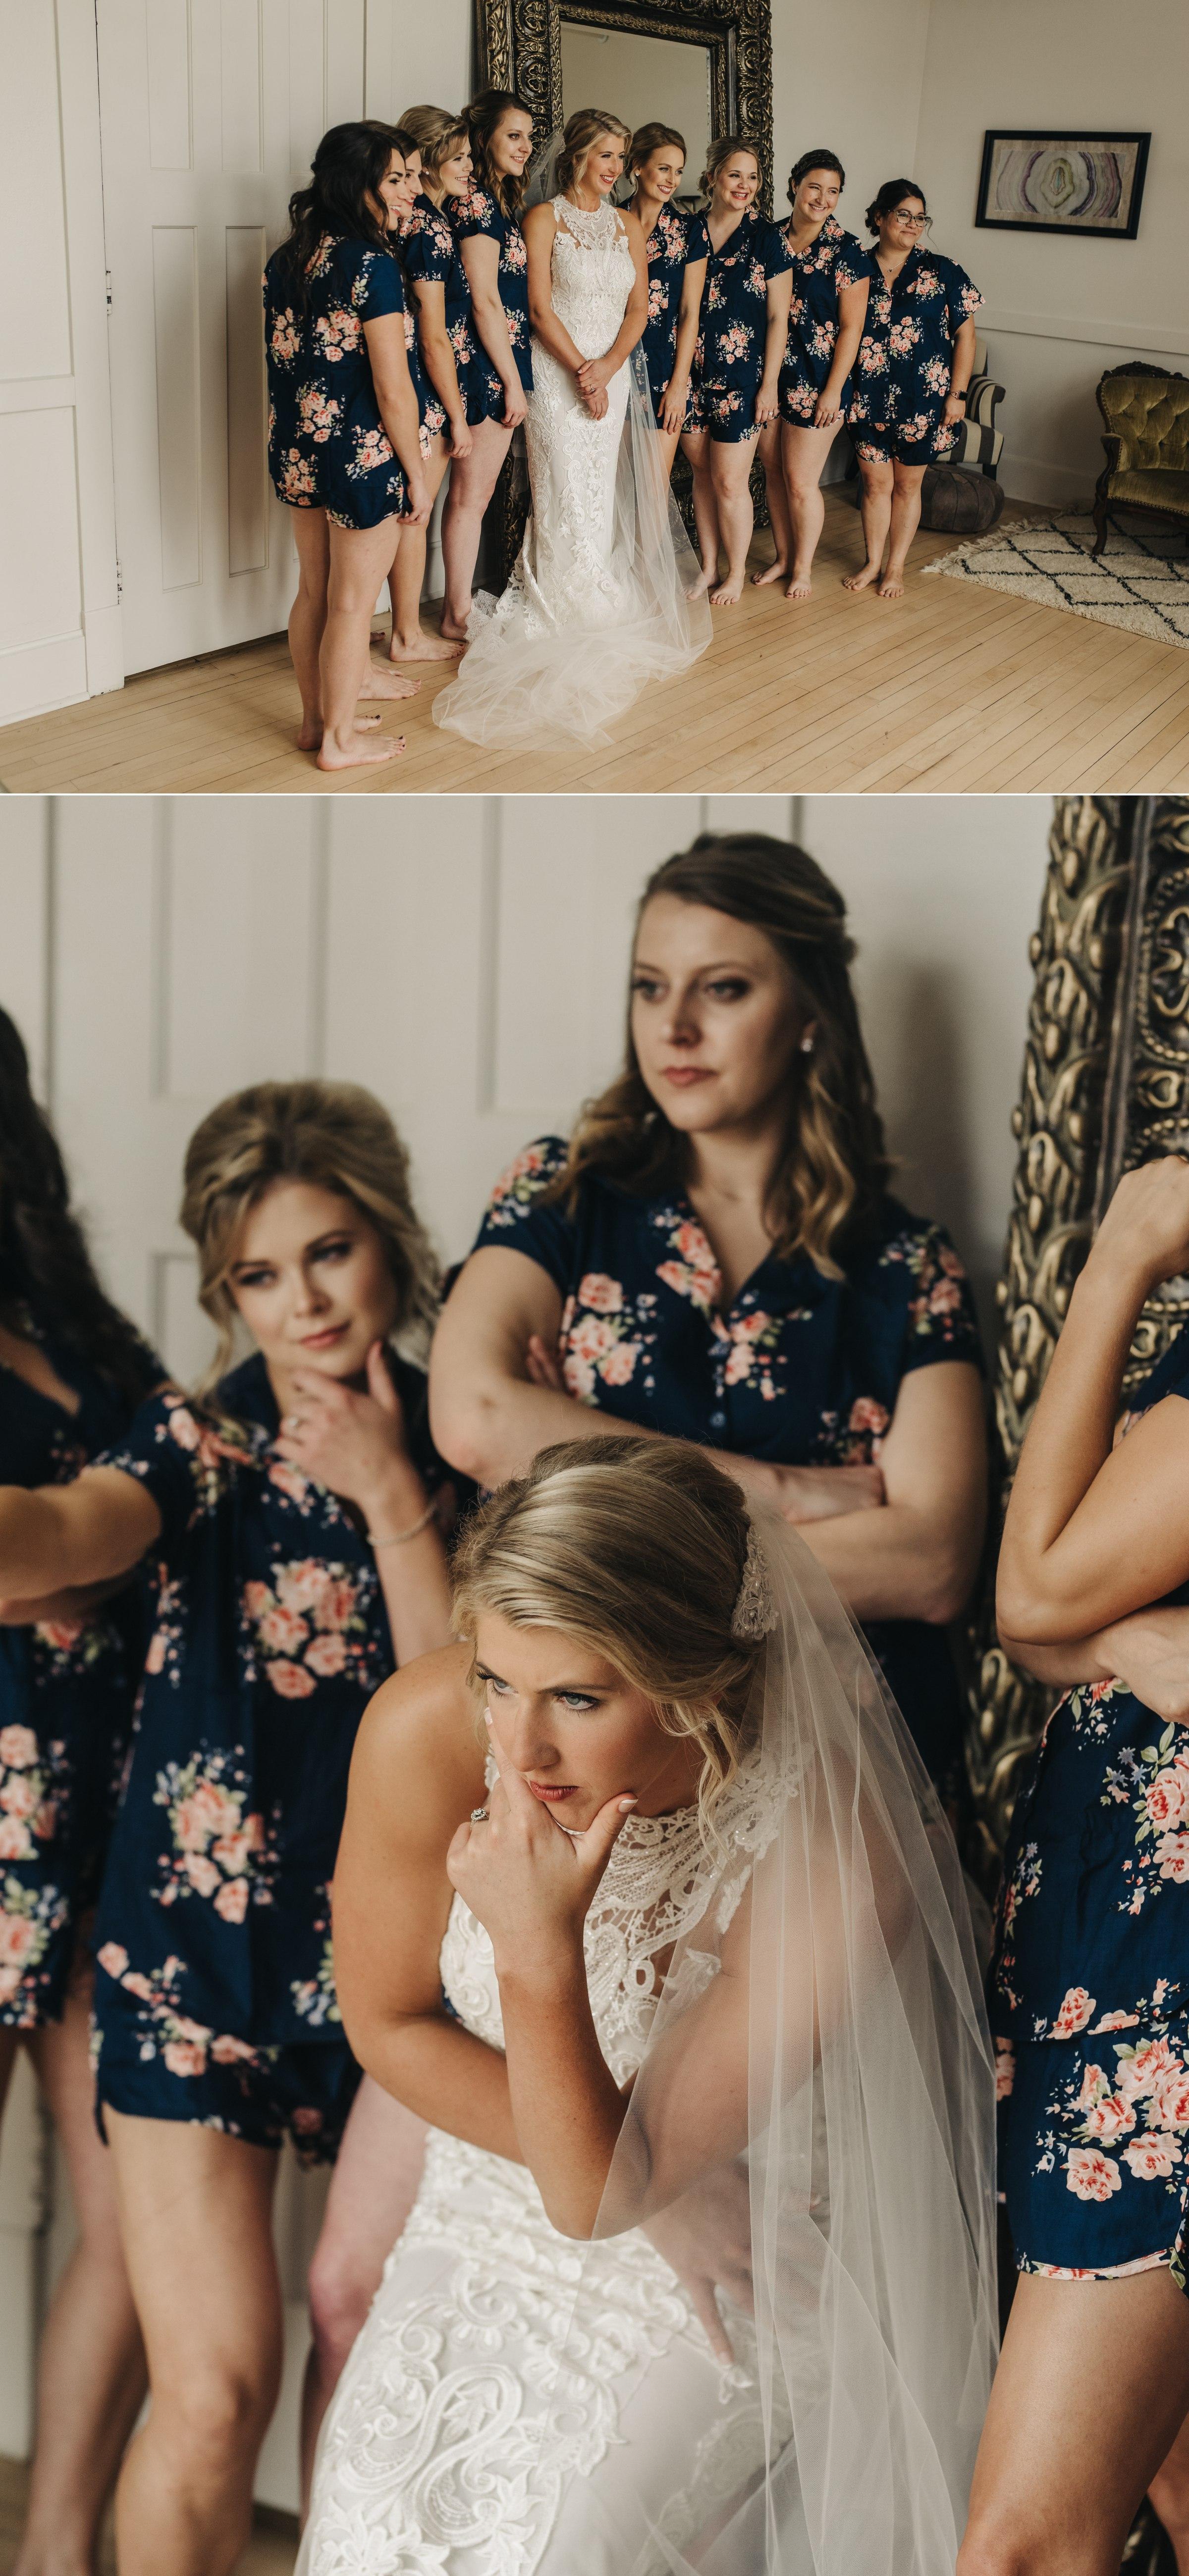 elopement-photographer-austin-best-wedding-minneapolis-adventurous-wedding-modern-morocco-new york-new orleans-mexica-costa rica-italy-affordable-best_0047.jpg